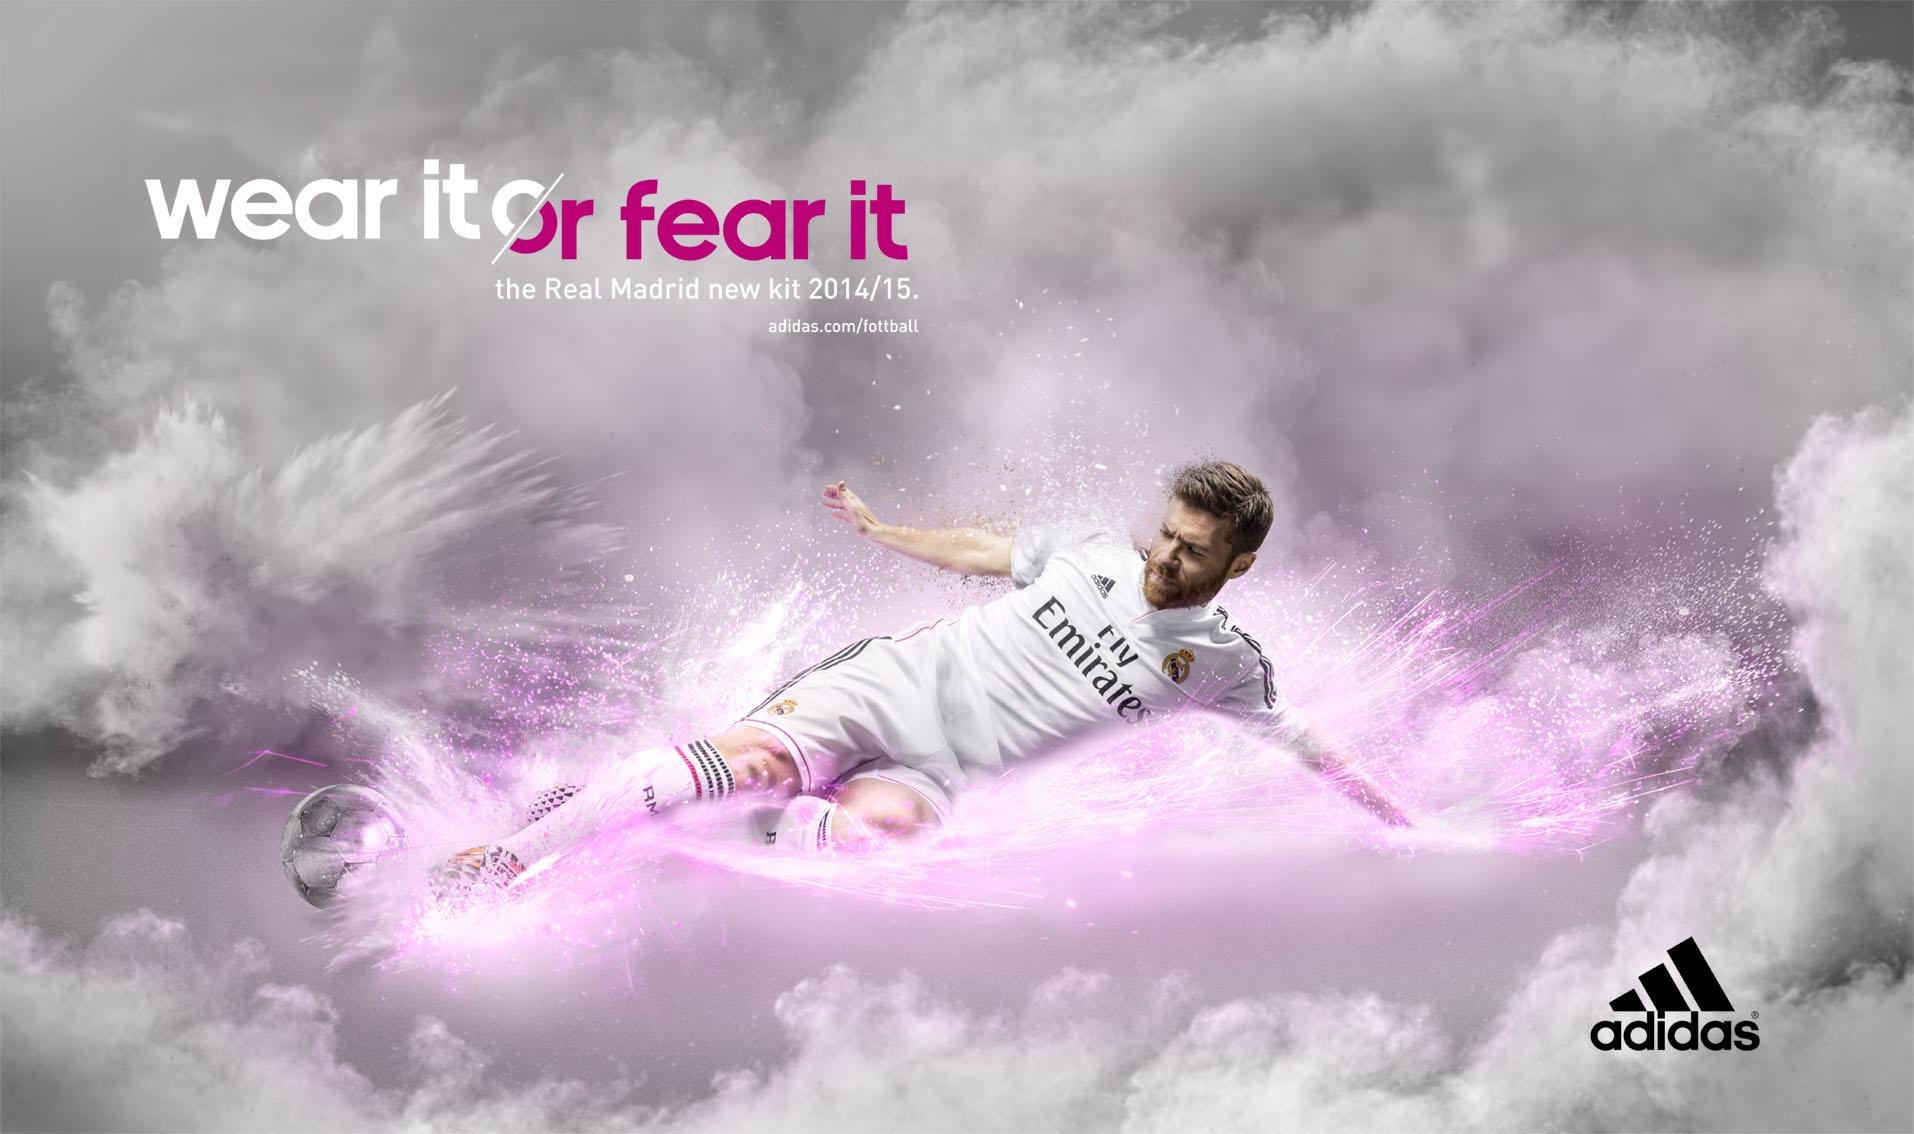 c football alonso_adidas.jpg